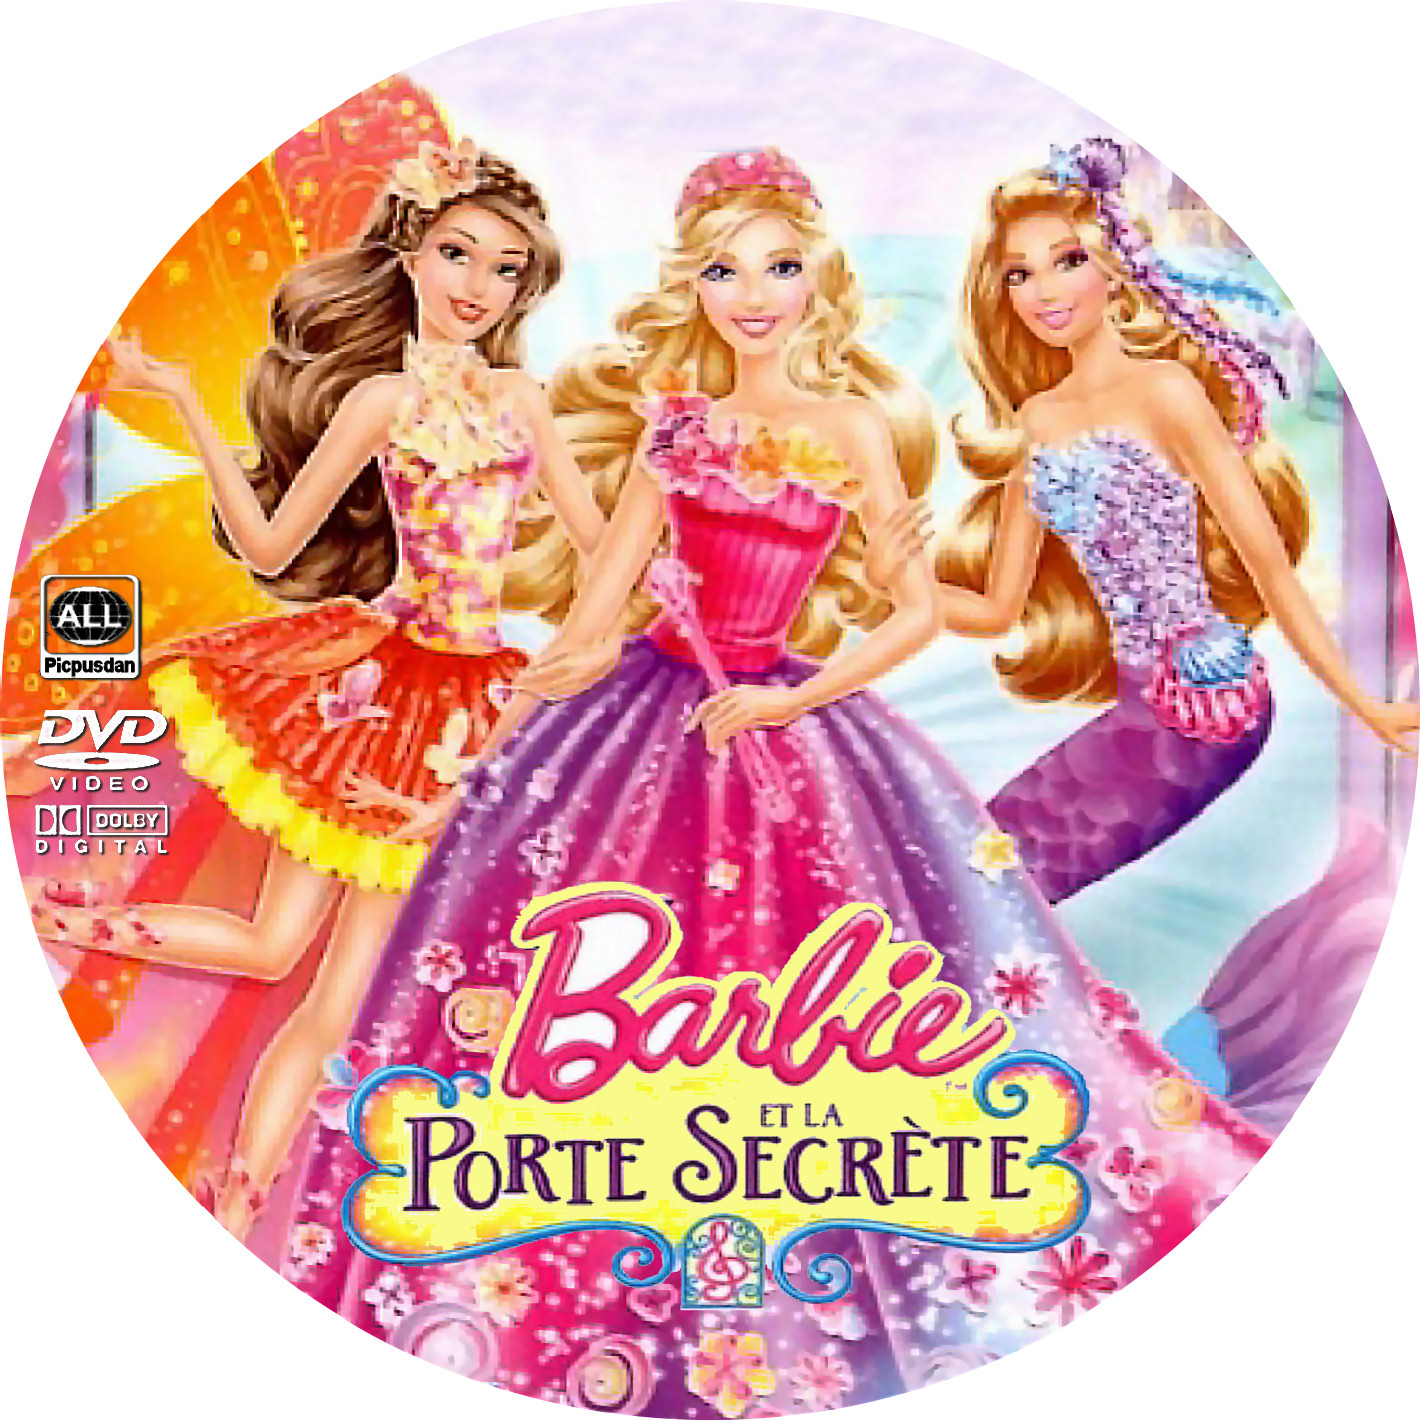 Image barbie et la porte barbiep dia - Barbie et la porte secrete film complet ...